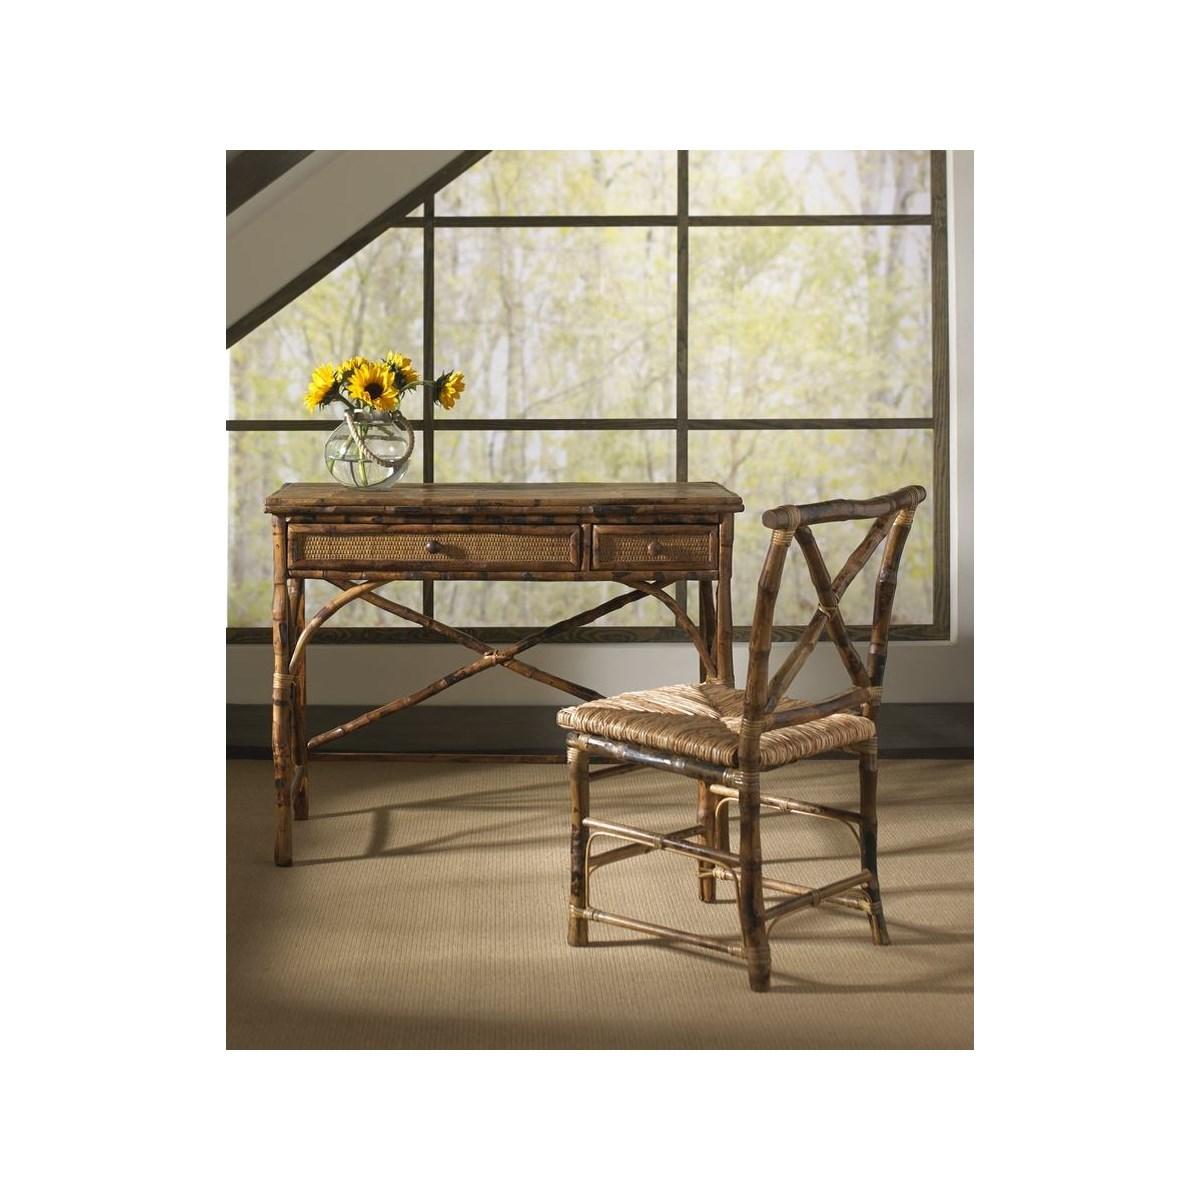 English Desk & Chair Frame Color - Antique Tortoise